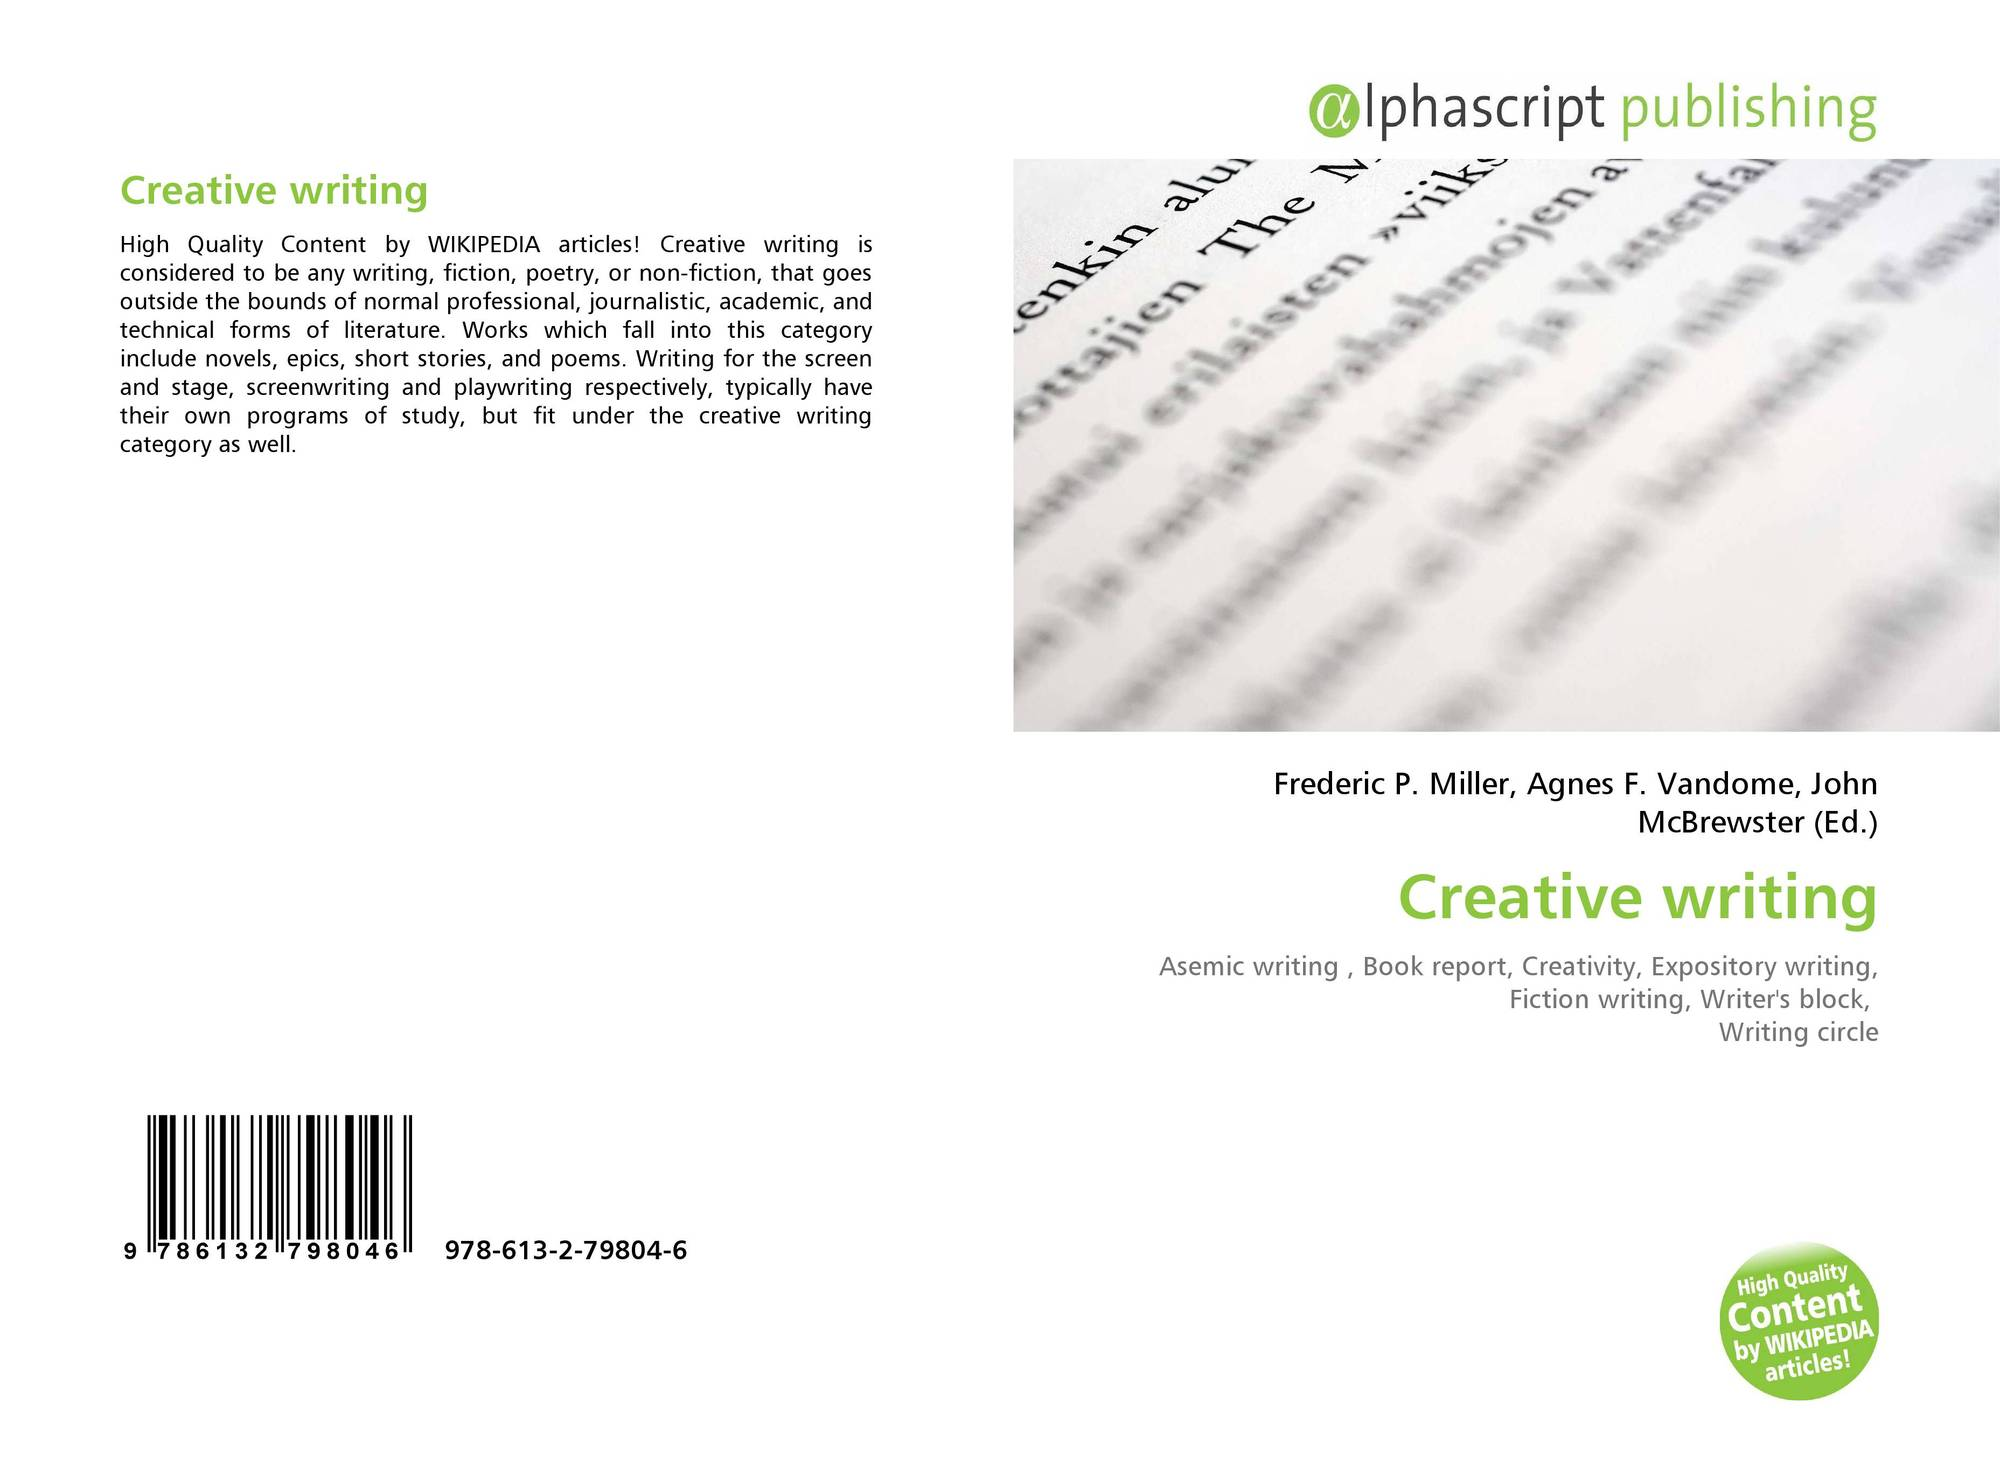 Creative writing pedagogy journal